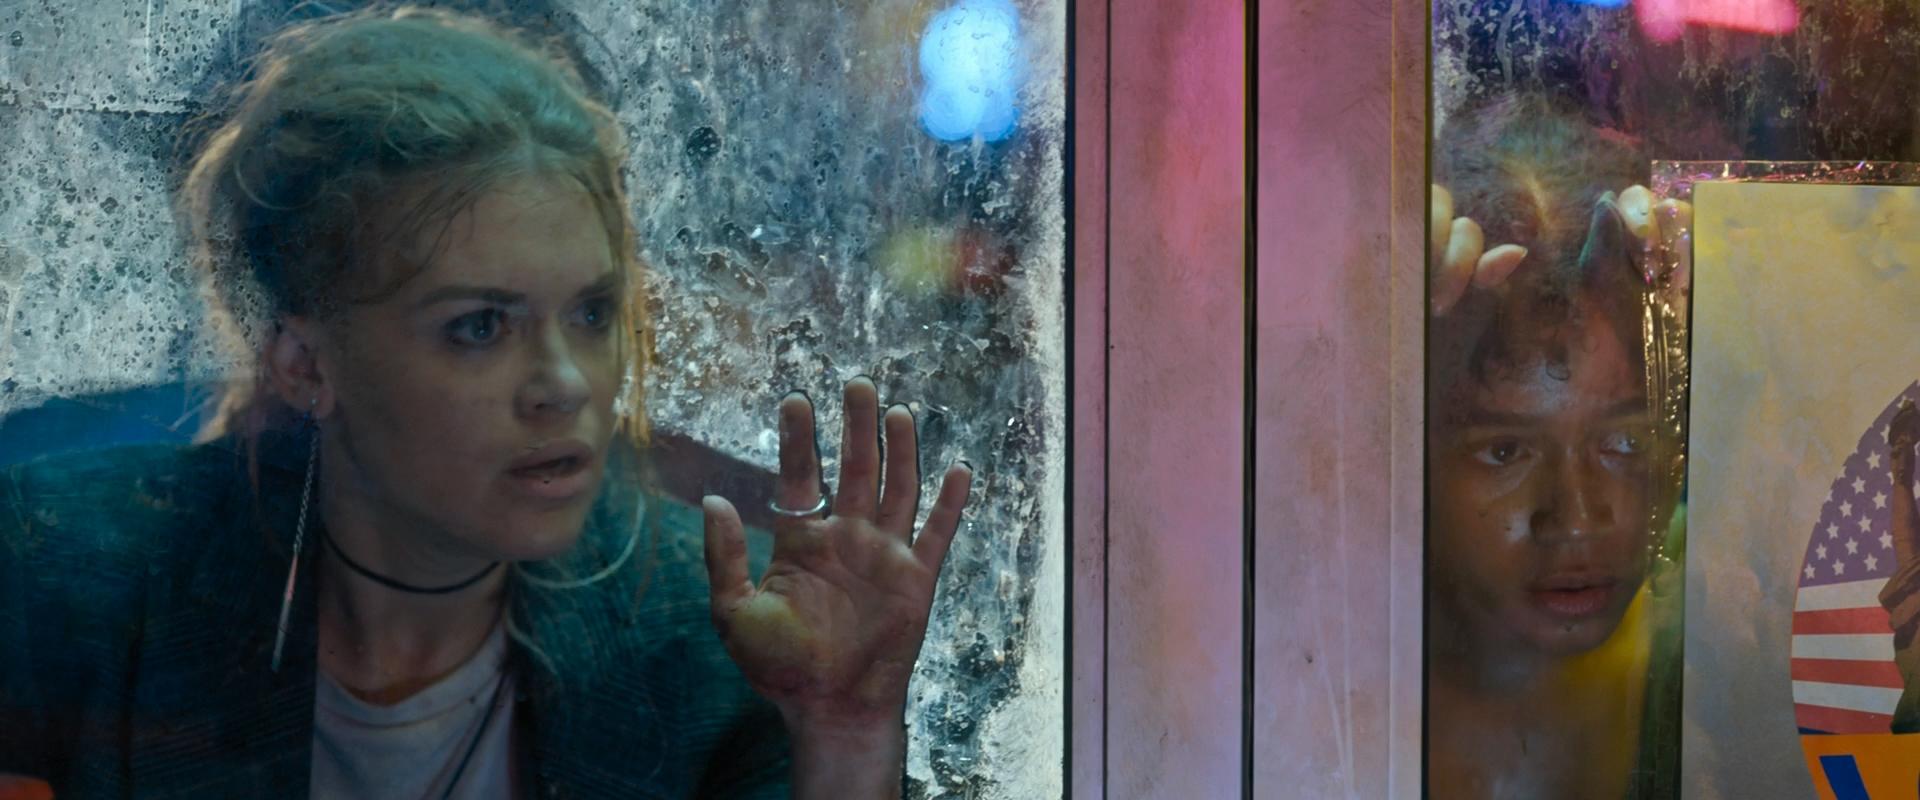 Escape Room 2: Reto mortal (2021) Extended Cut 1080p WEB-DL Latino